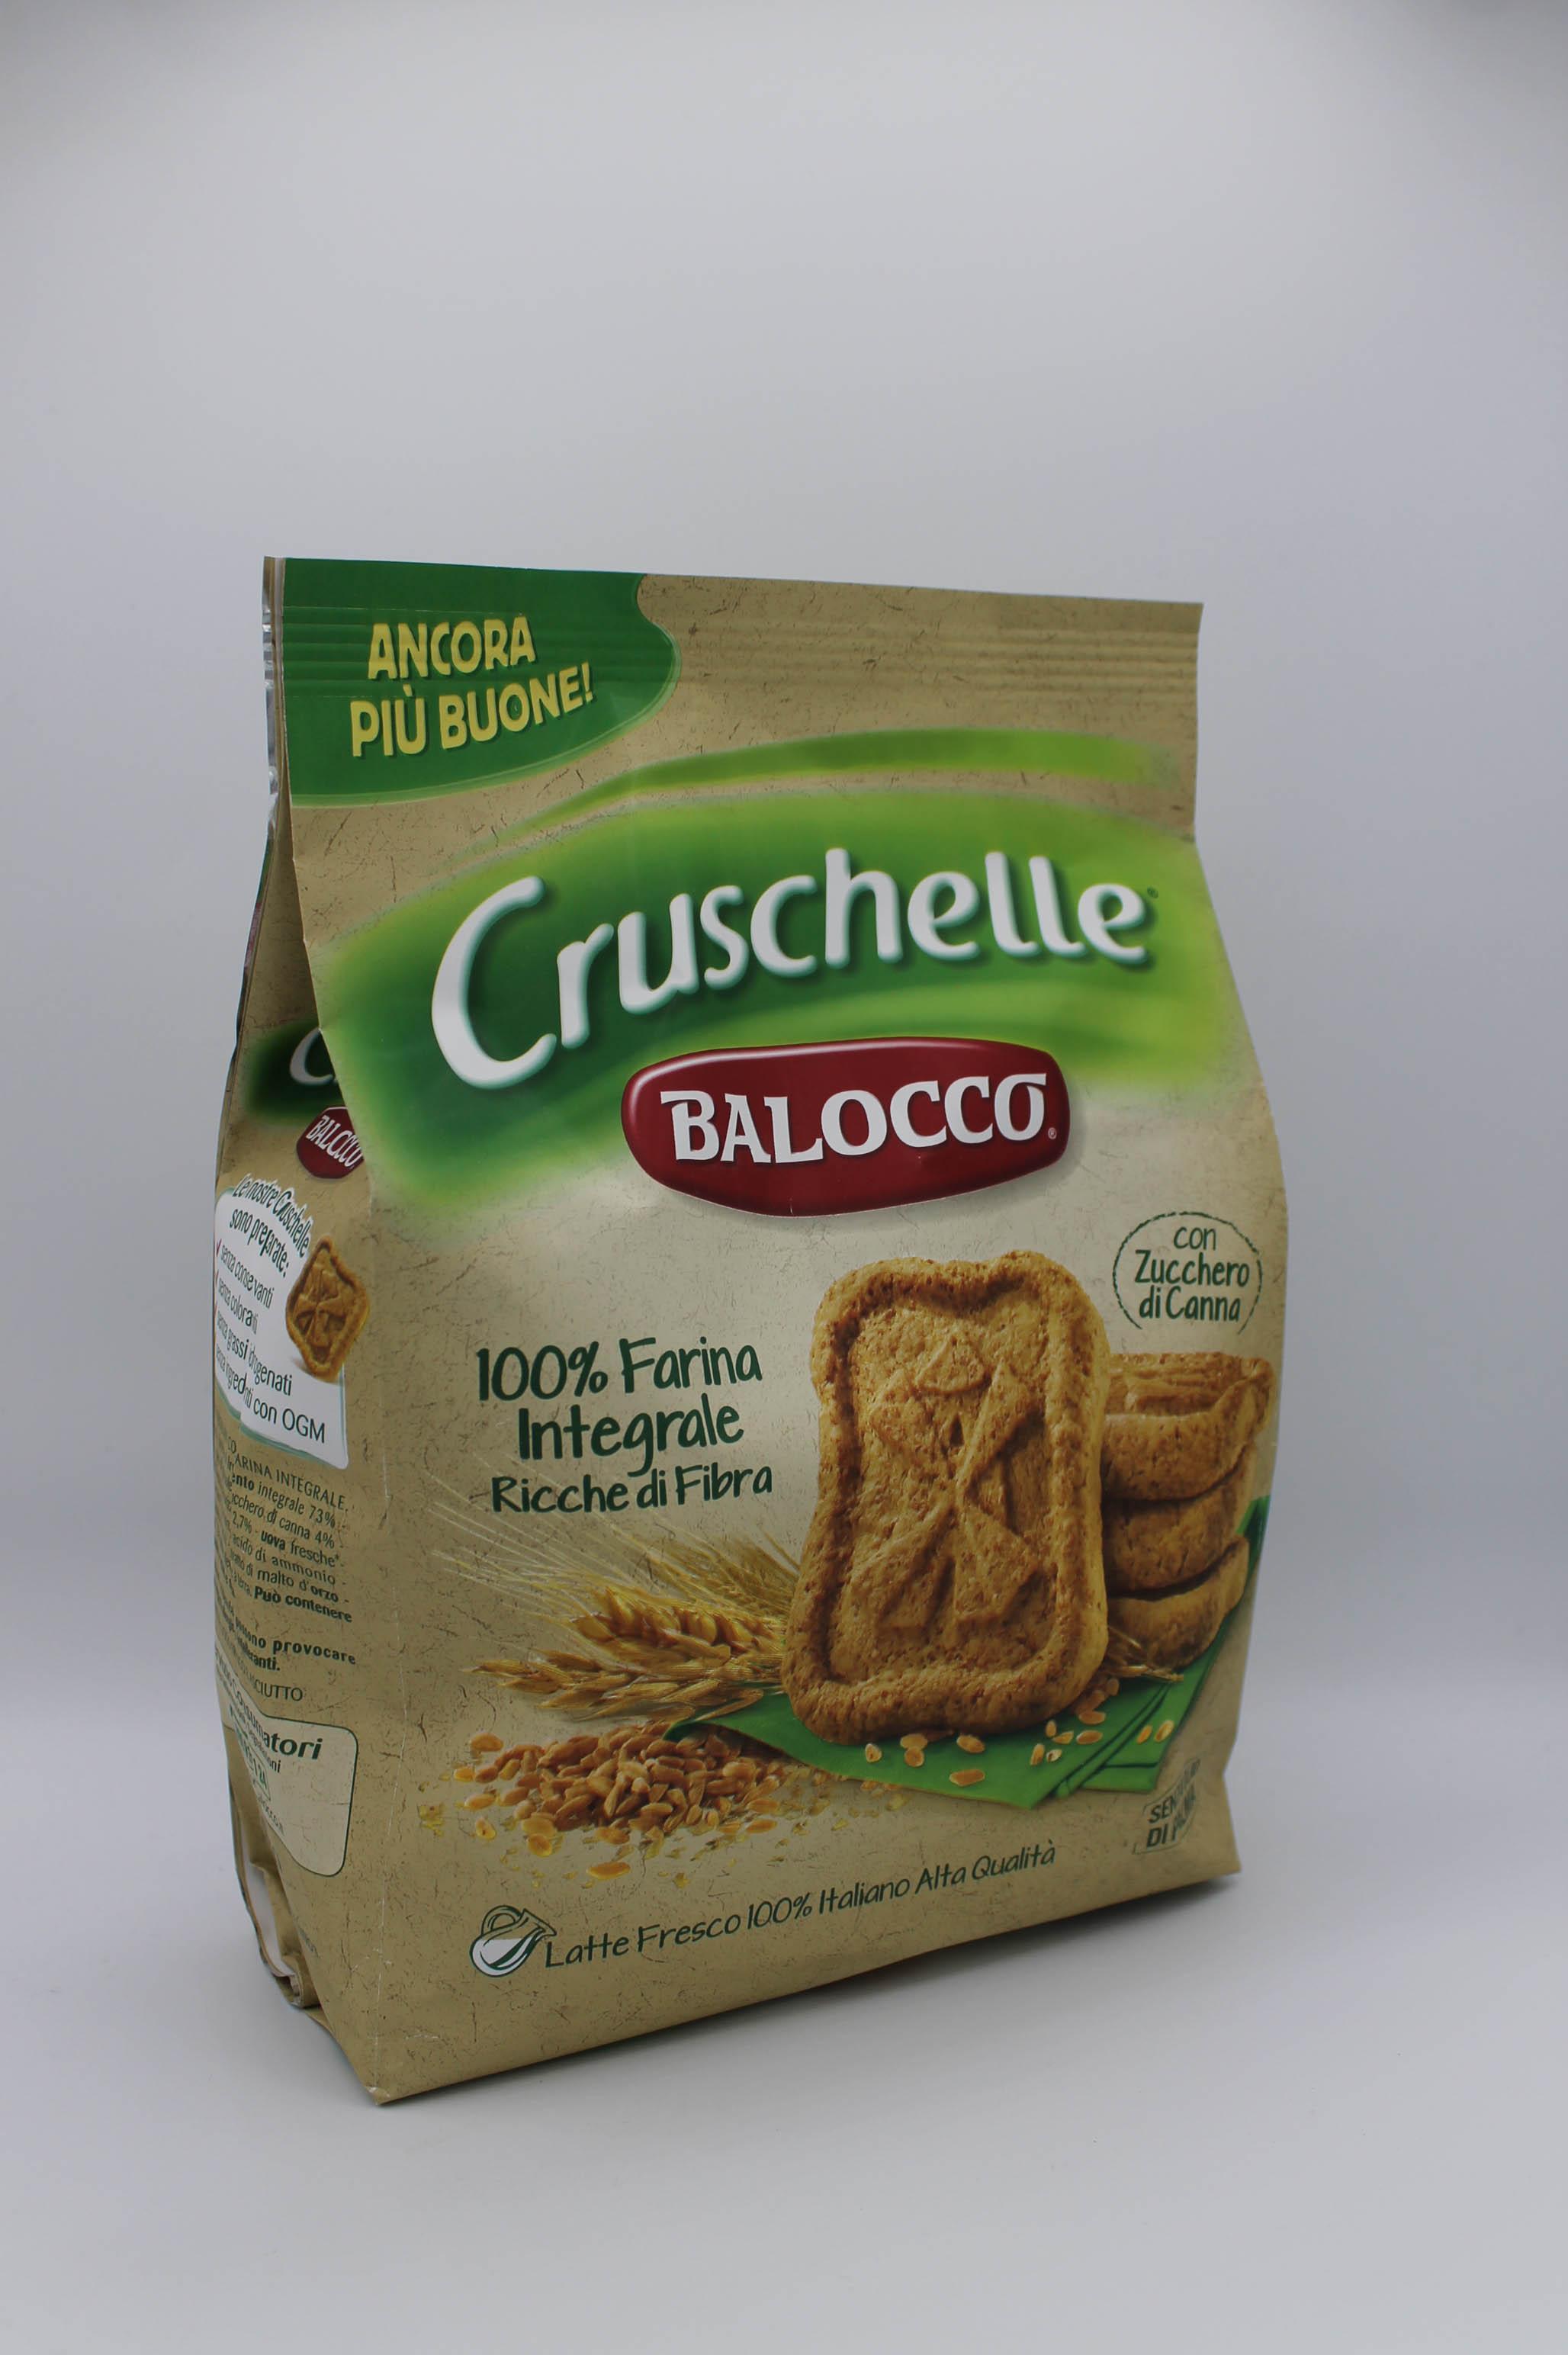 Balocco biscotti 700 gr vari gusti.